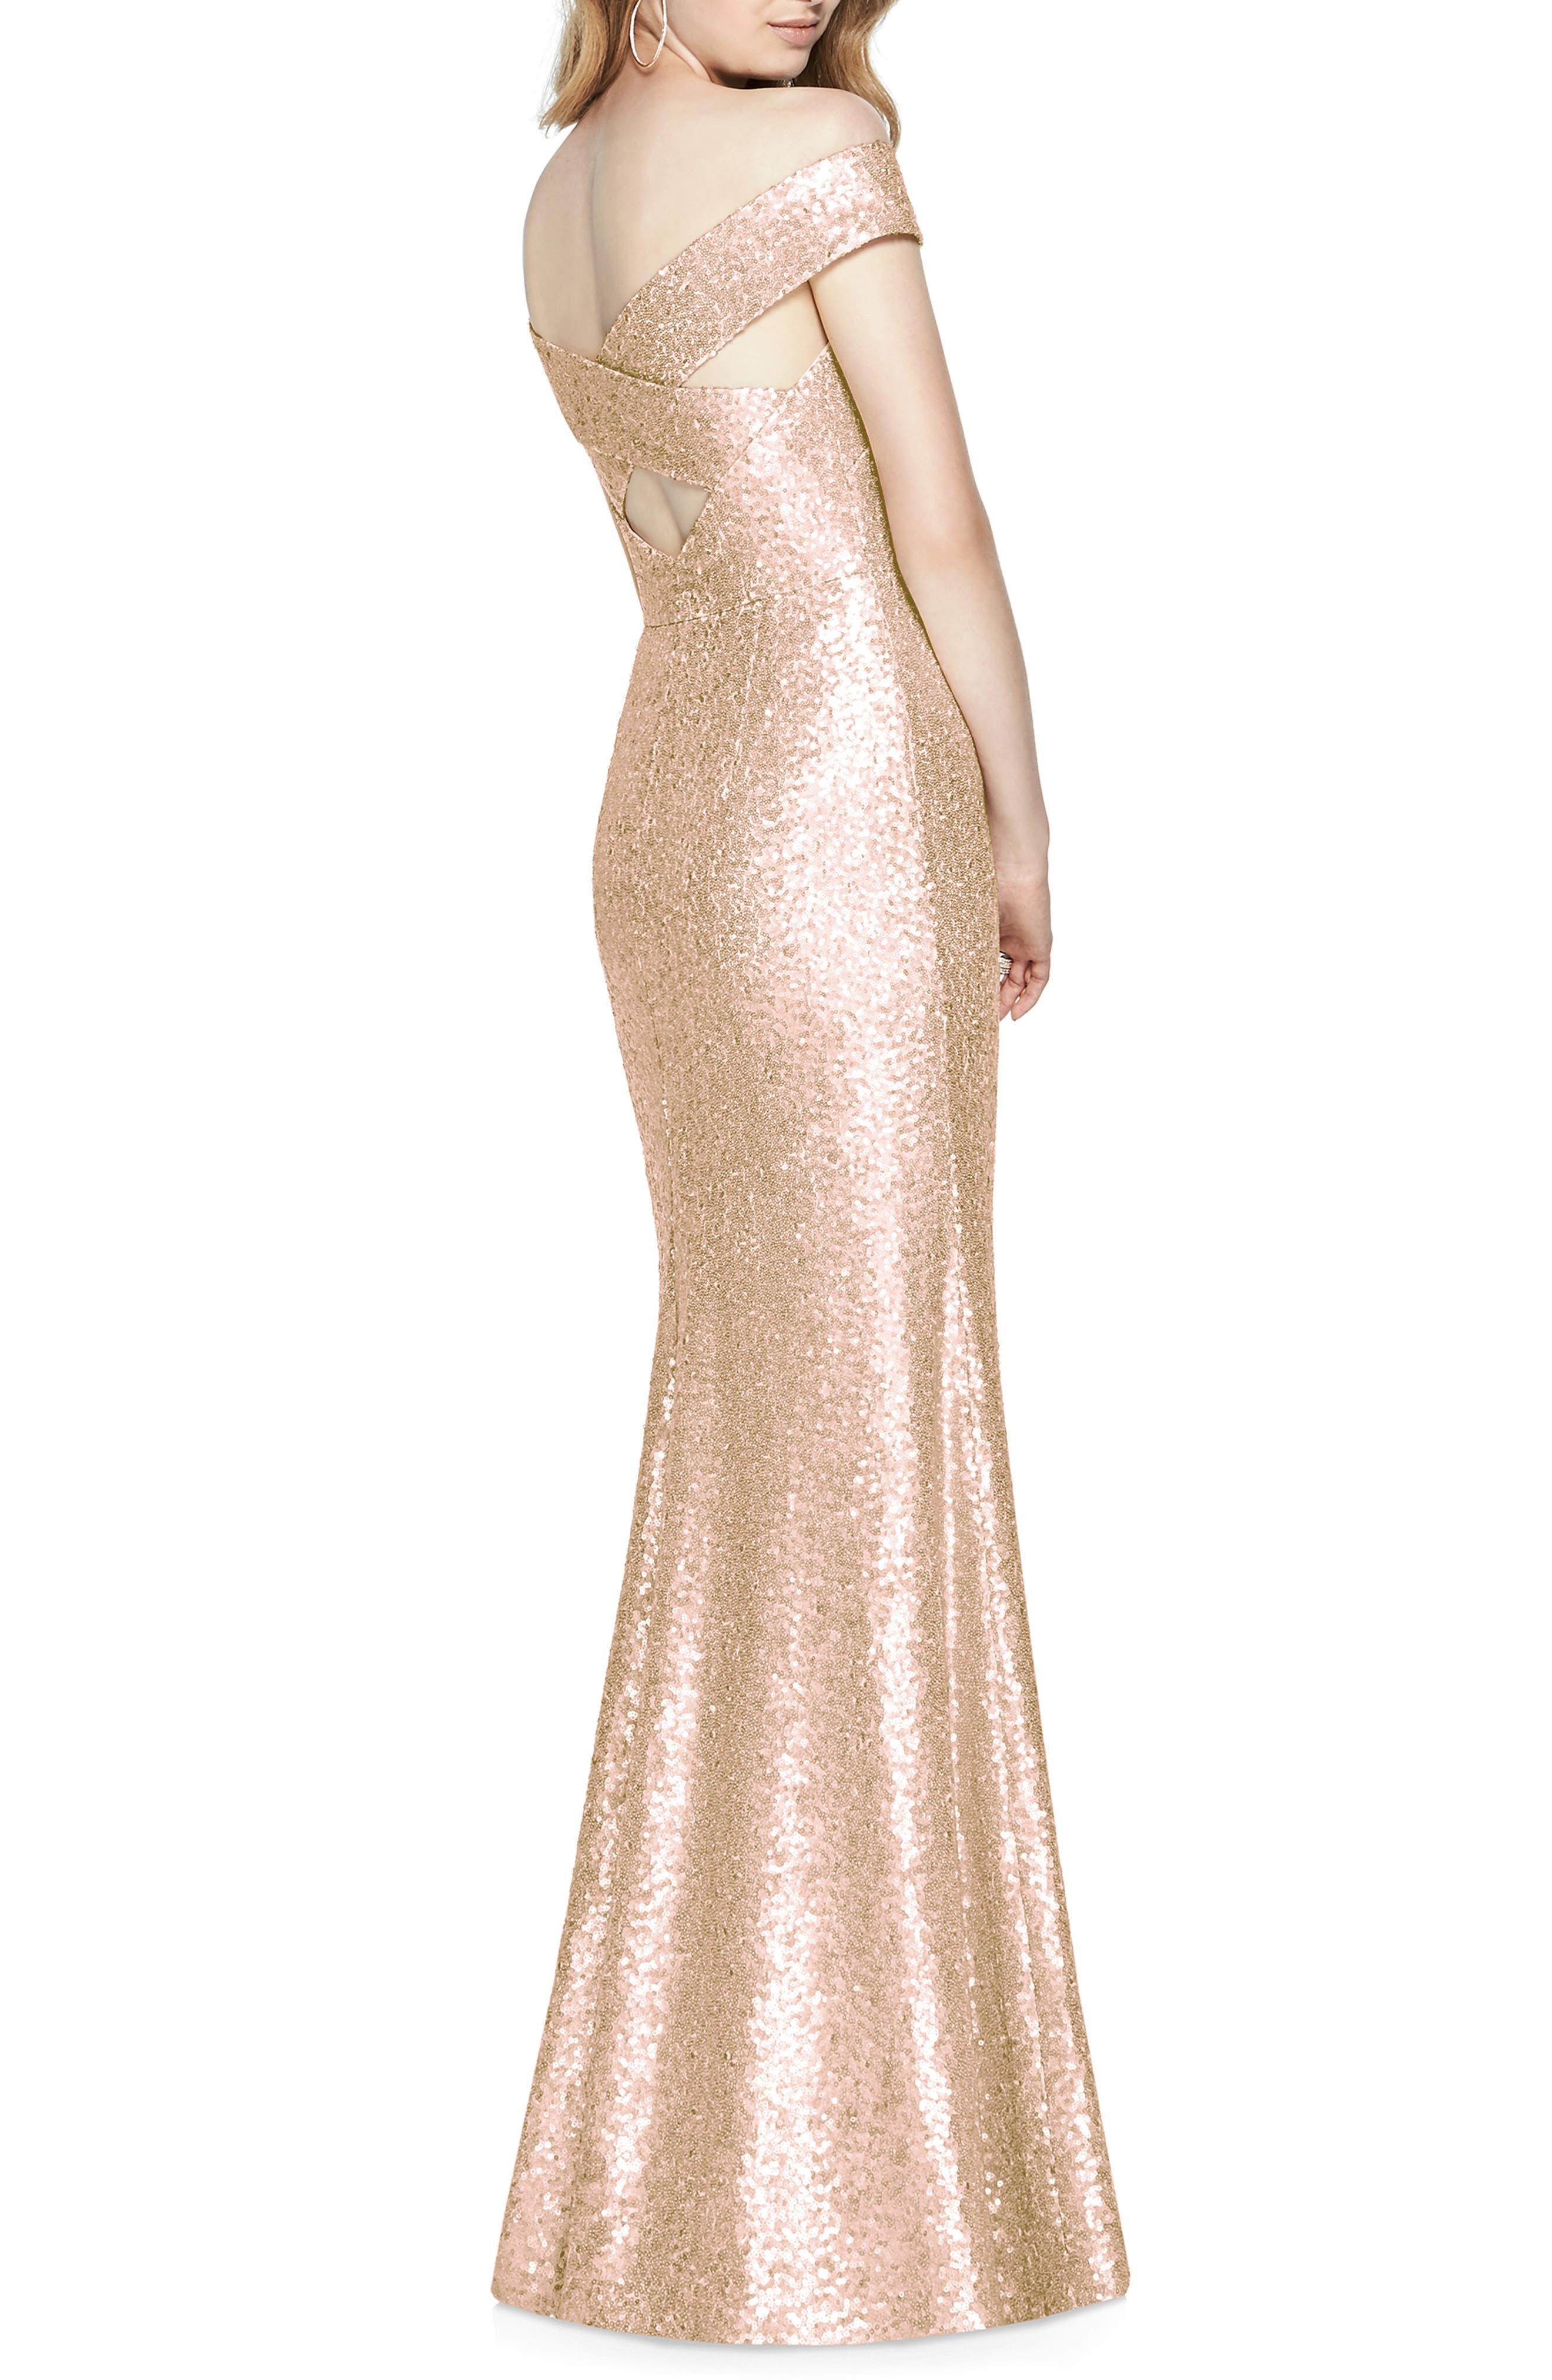 Sequin Off the Shoulder Gown,                             Alternate thumbnail 2, color,                             ROSE GOLD